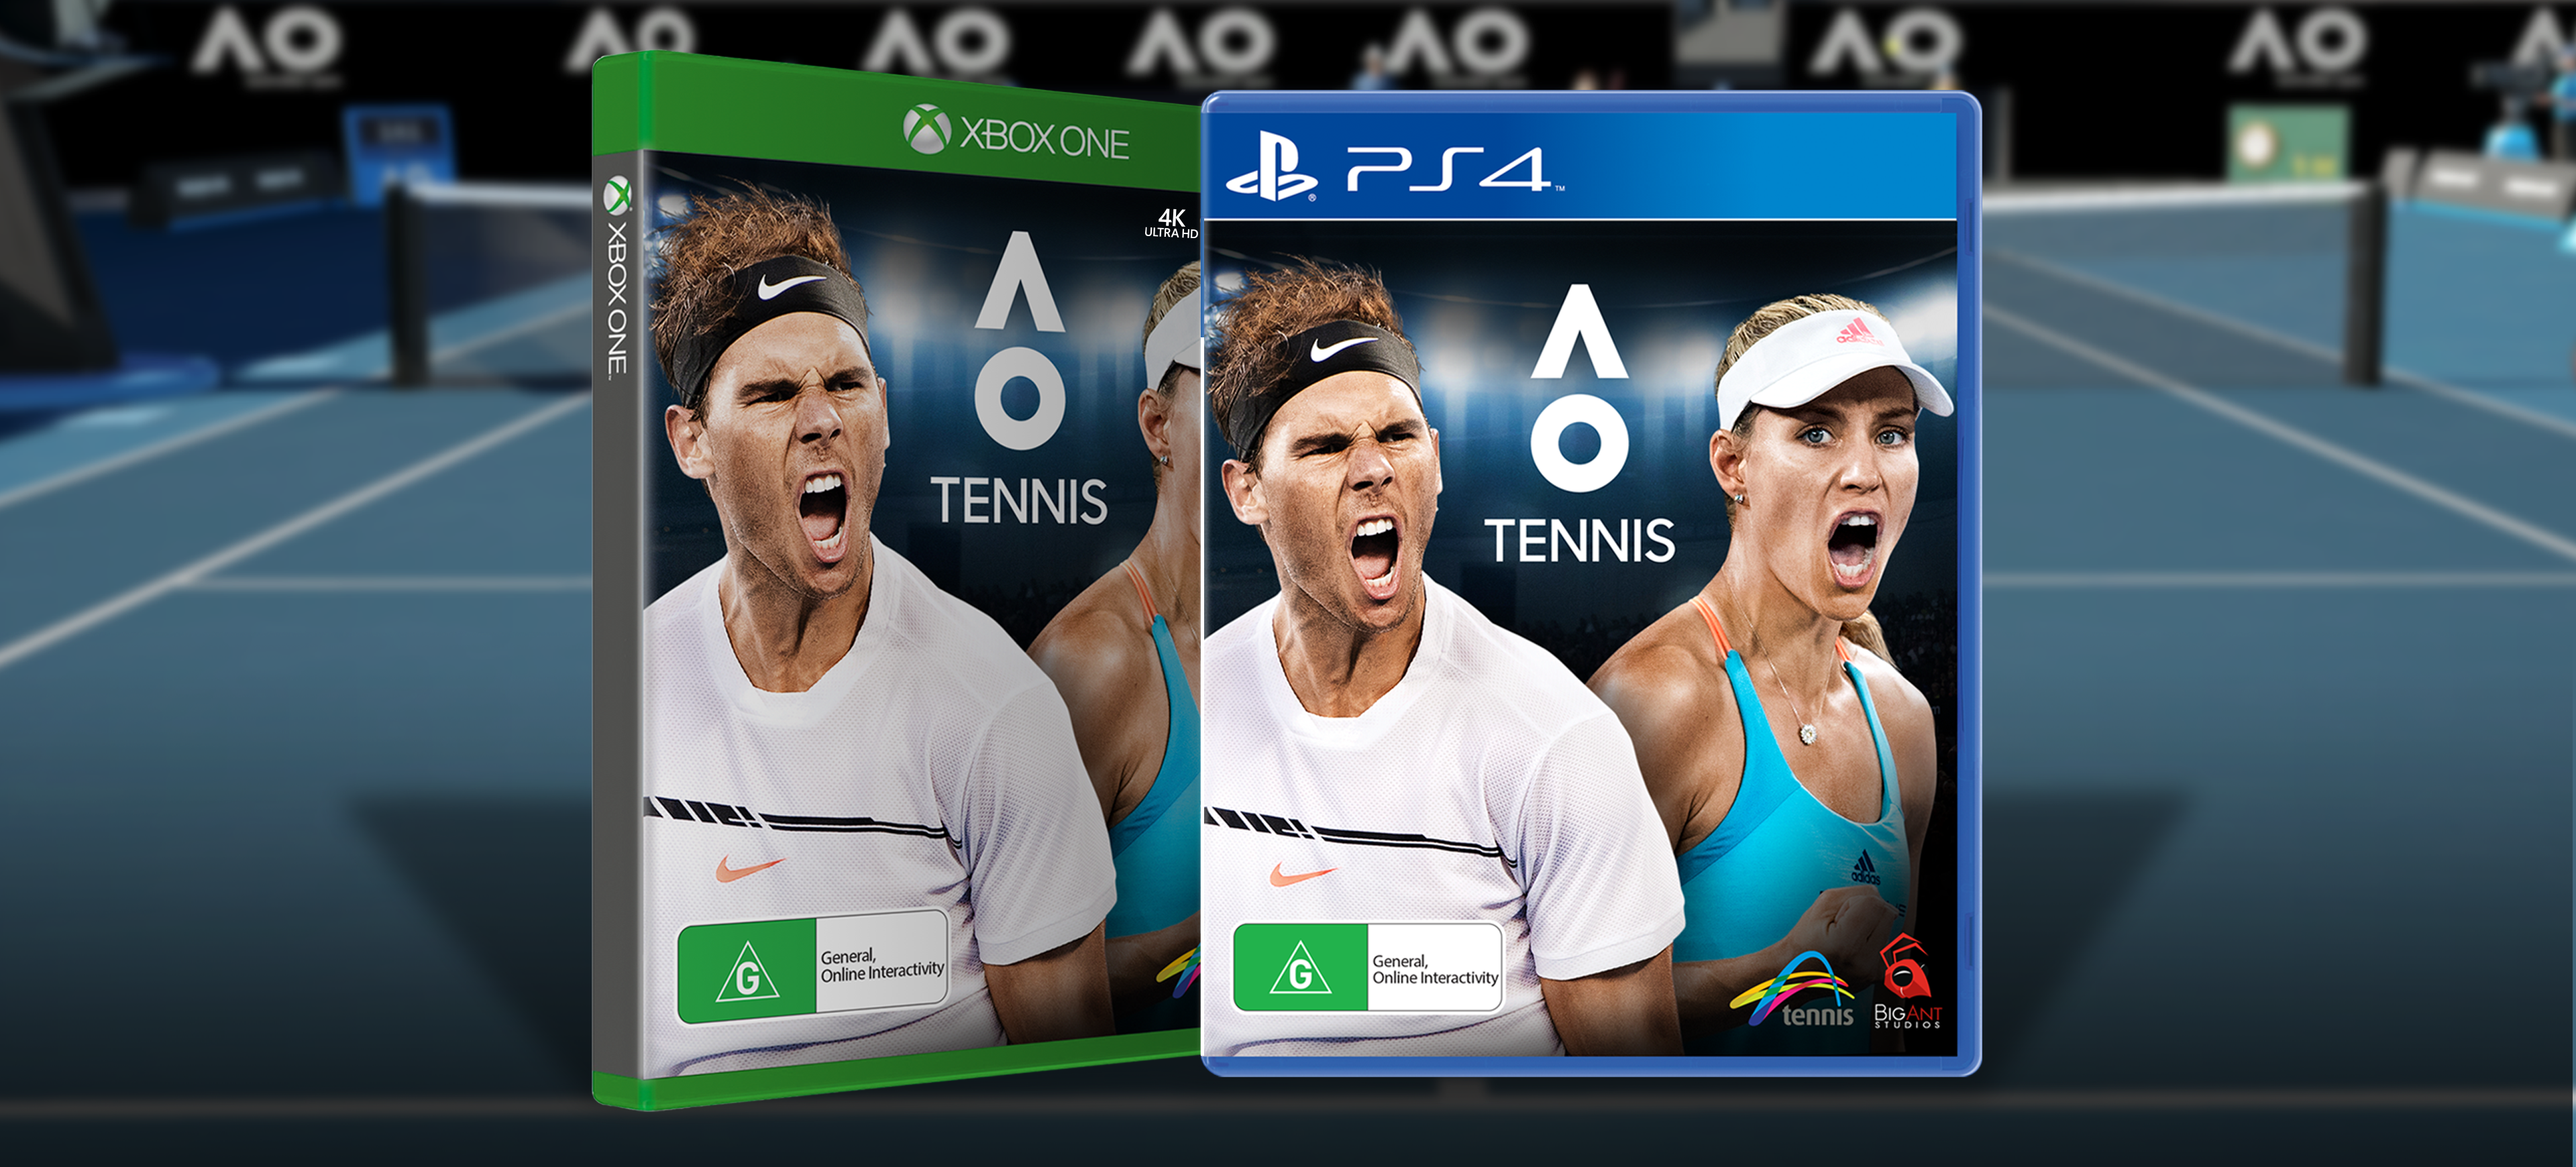 AO-Tennis-PS4-XBoxOne-Packshots